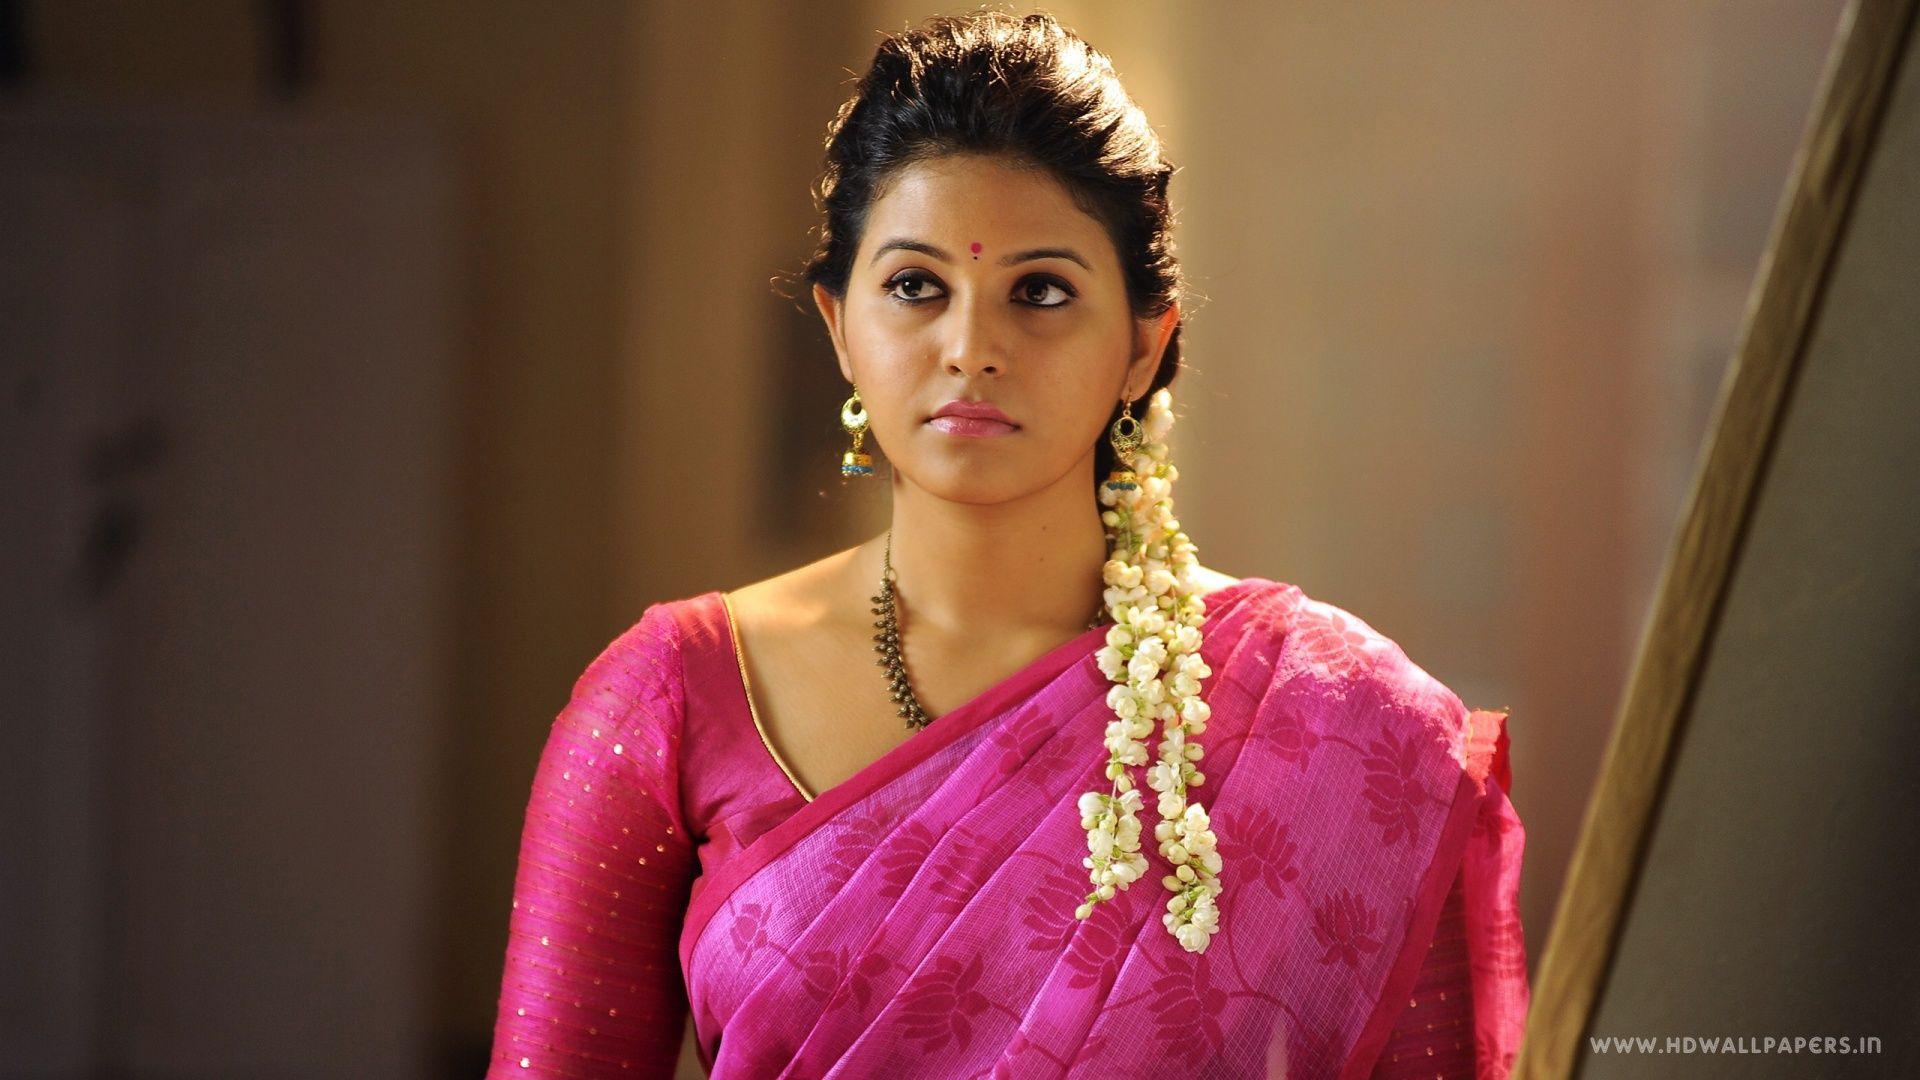 Wallpapers Tamil Actress - Wallpaper Cave